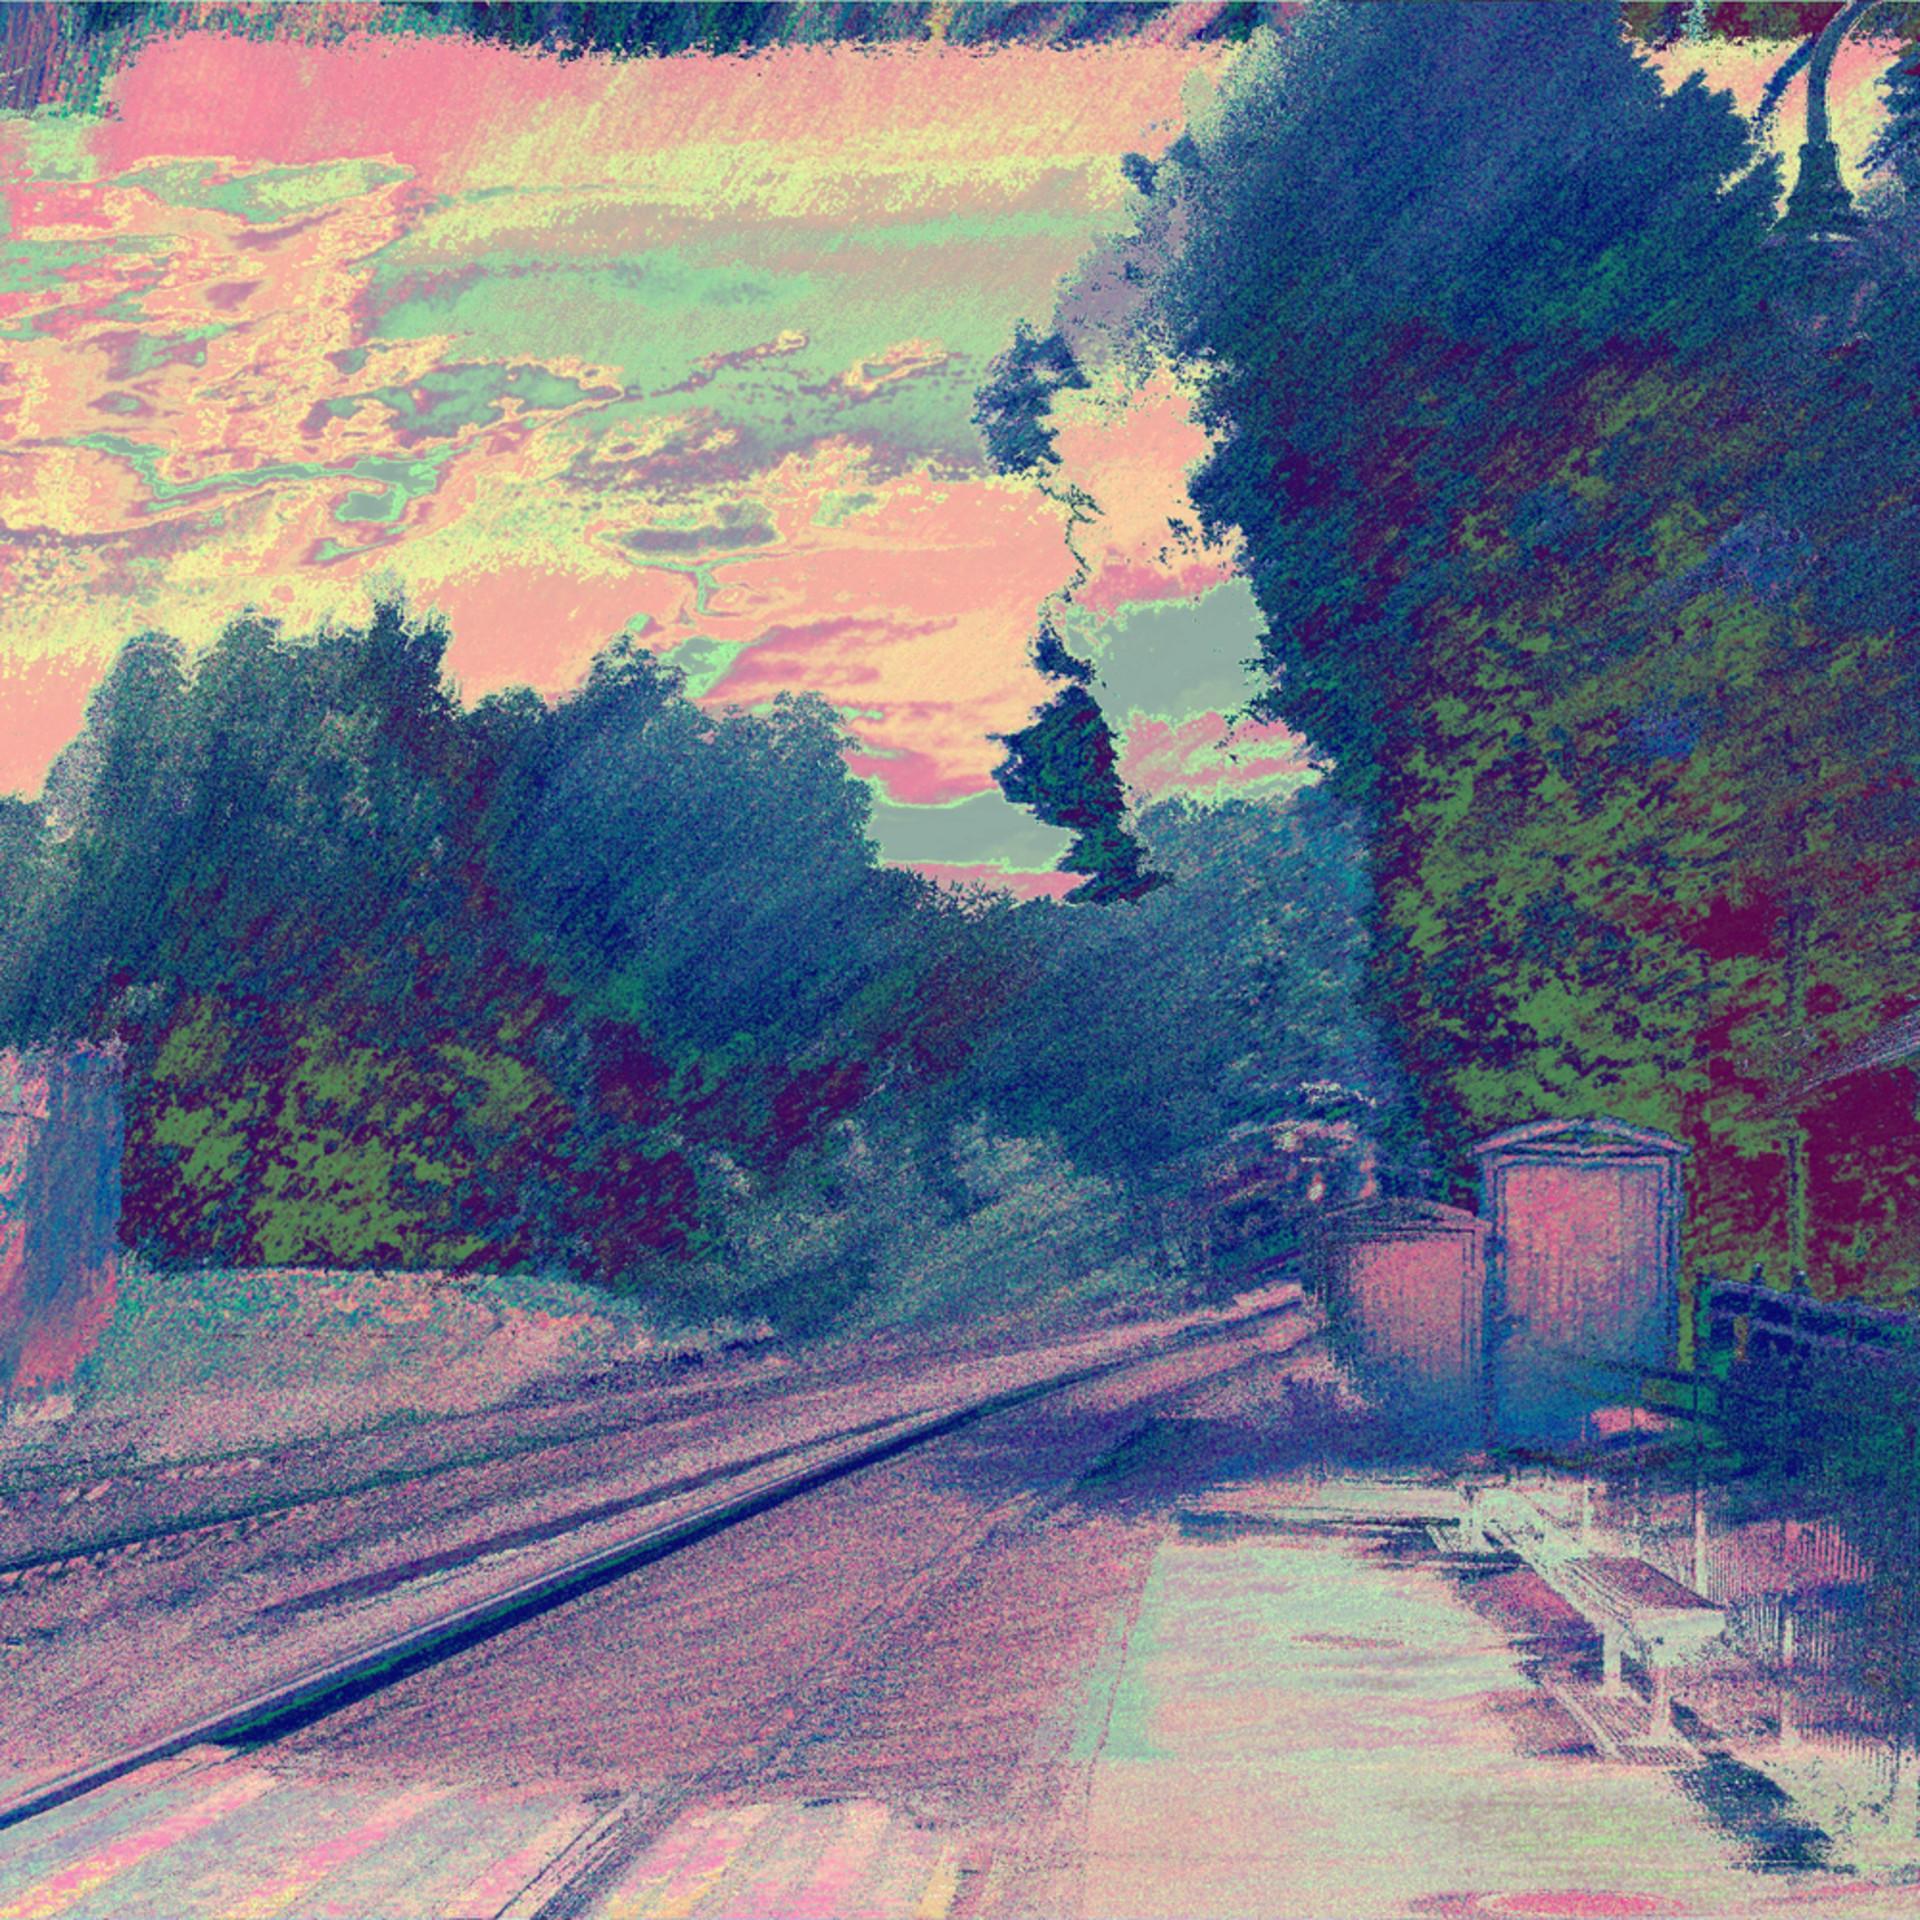 The train approaches kensington dawn ii jaw4eg